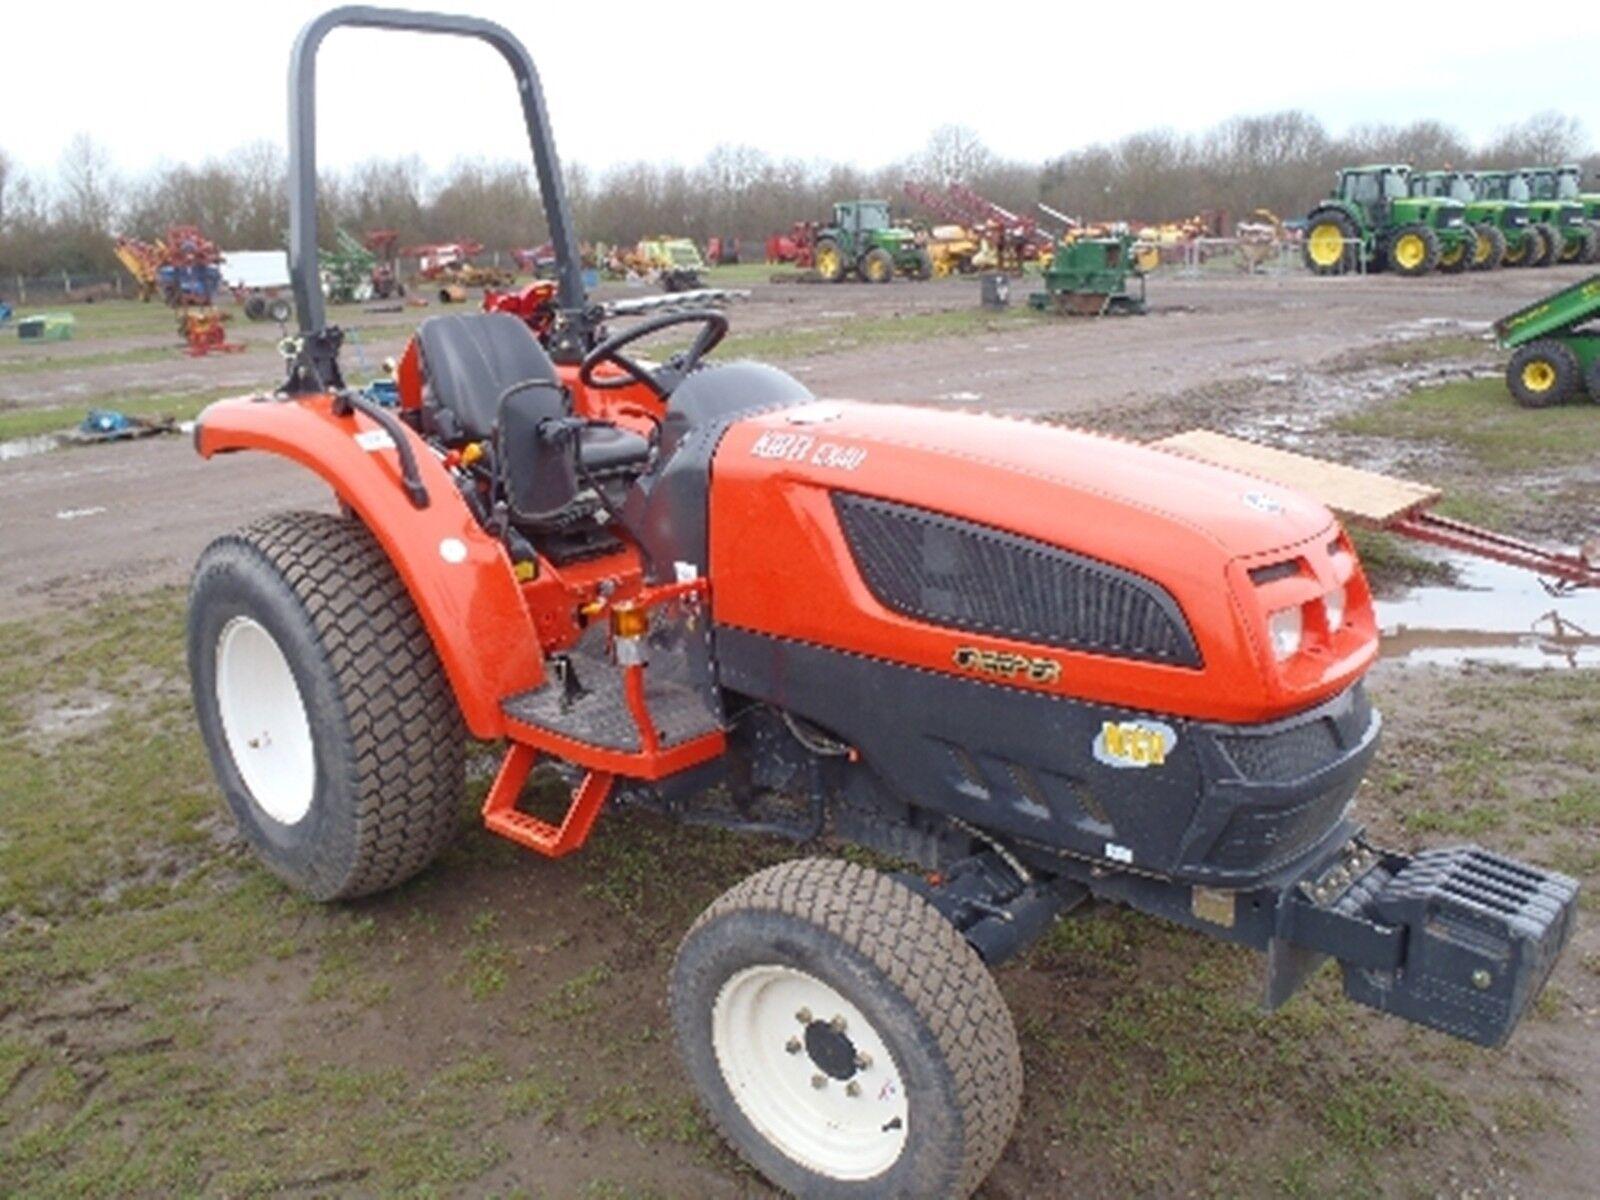 Kioti Ex 40 50 Tractor Workshop Parts Manuals Pdf Cd 495 Wiring Diagrams 1 Of 7free Shipping 2 7